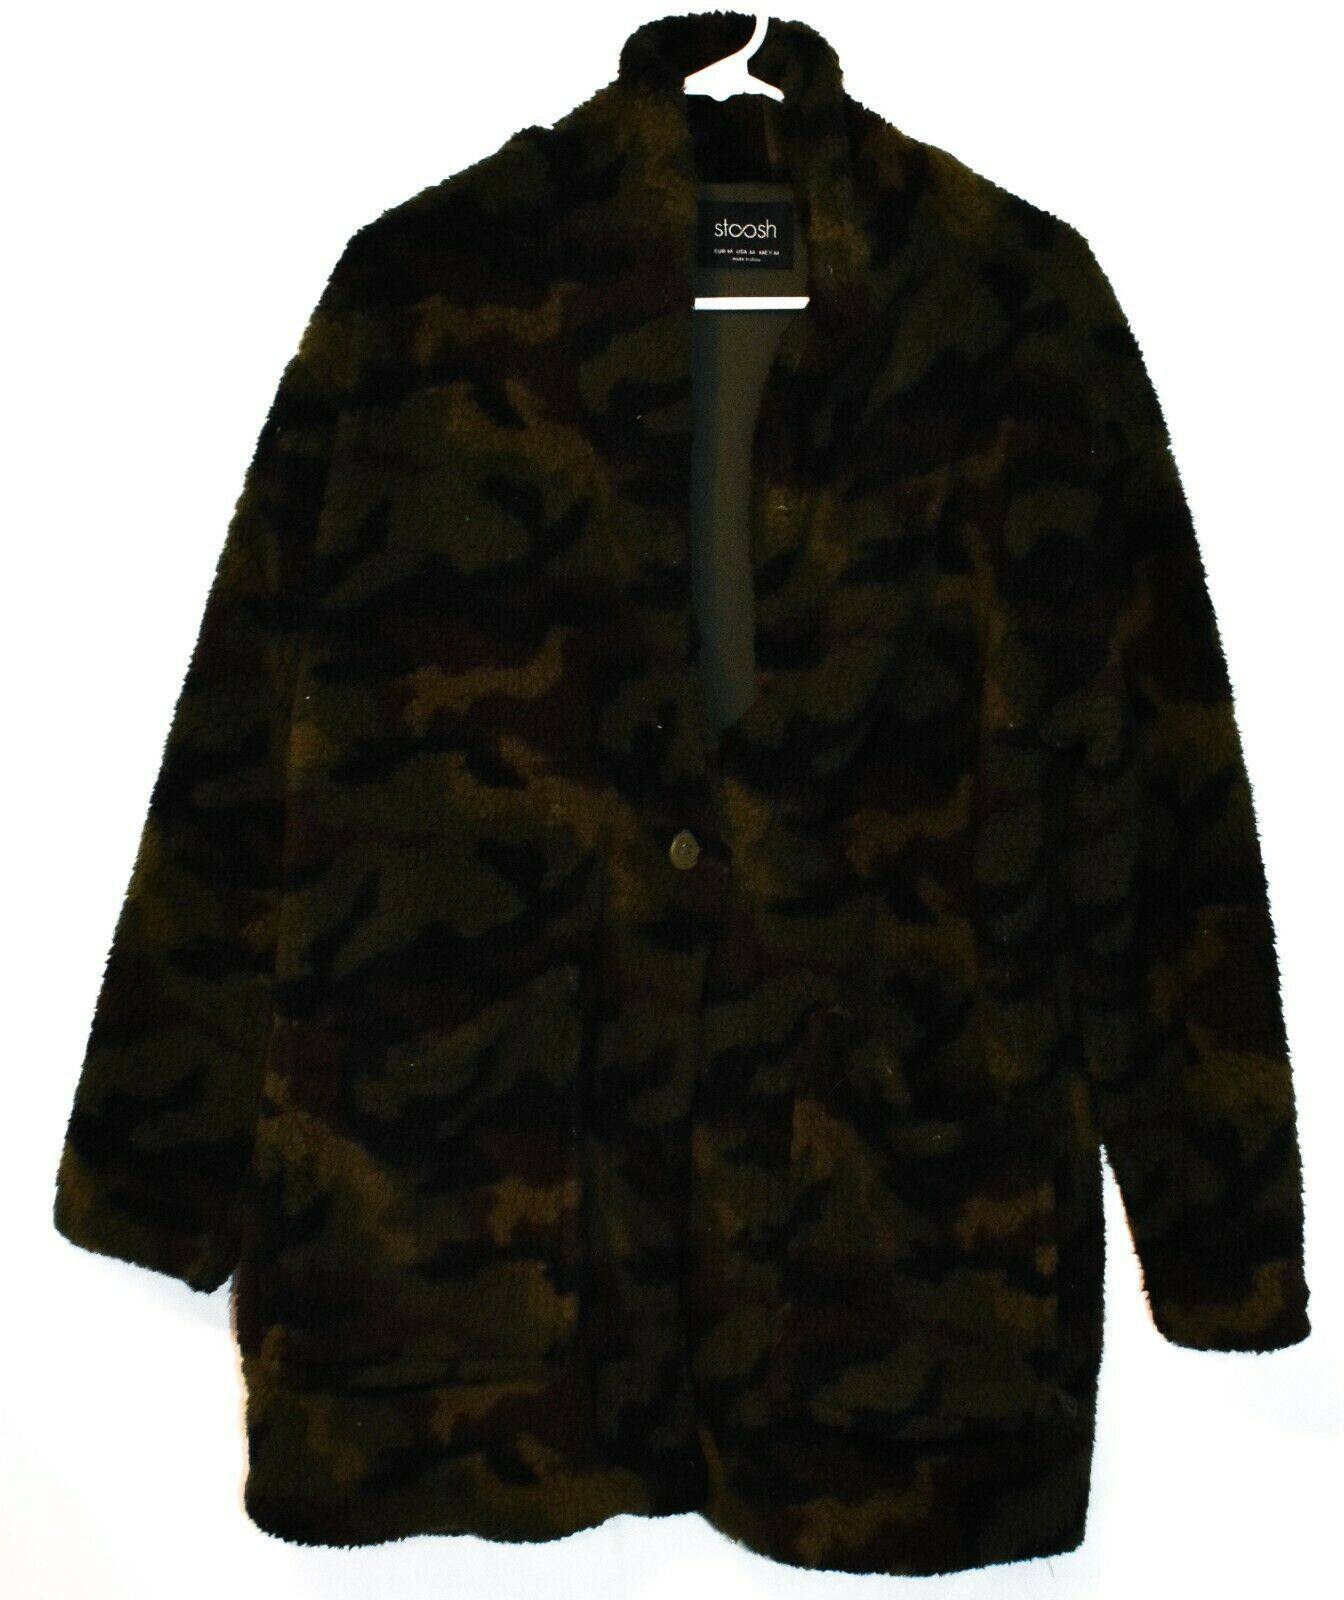 Stoosh Women's Ashley Oversized Green Camouflage Camo Fleece Jacket Size M